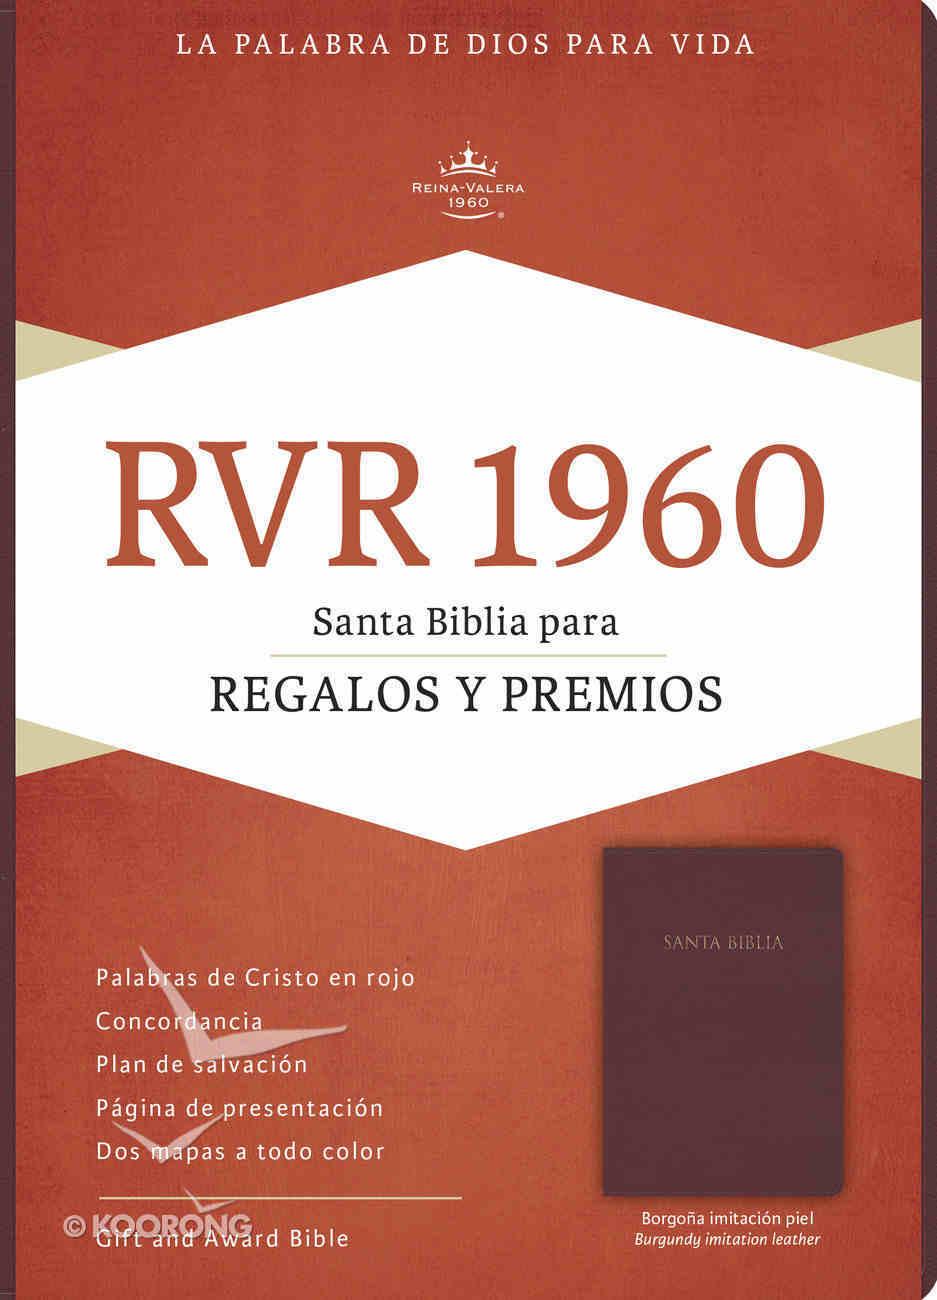 Rvr 1960 Biblia Para Regalos Y Premios Borgona (Red Letter Edition) (Burgundy) Imitation Leather